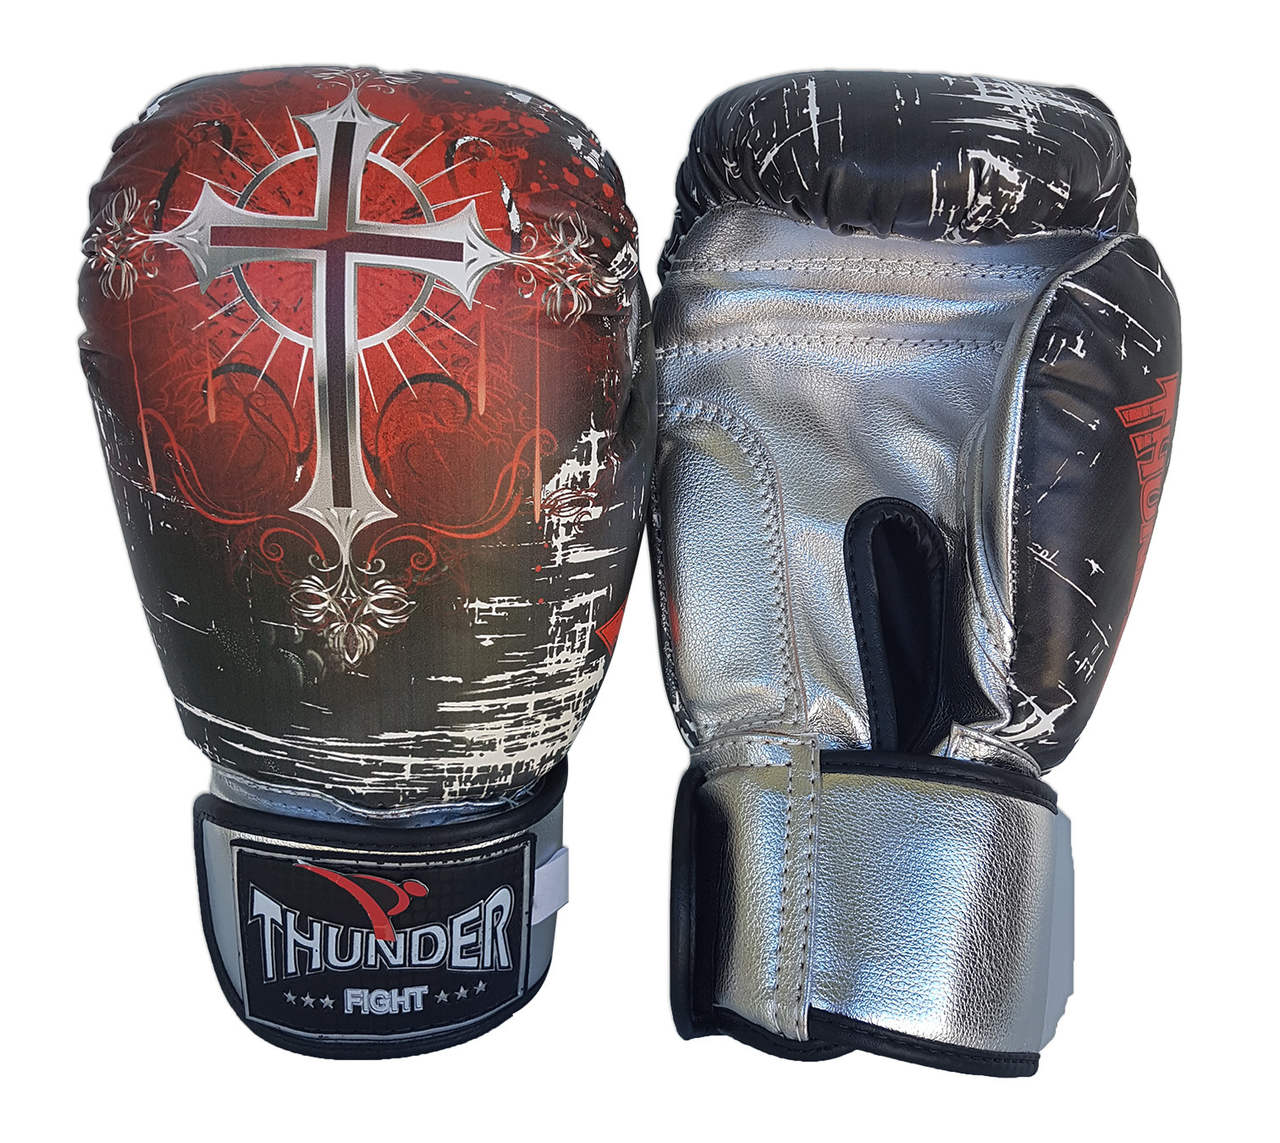 Kit de Boxe / Muay Thai 10oz - Caveira / Cruz - Thunder Fight   - PRALUTA SHOP